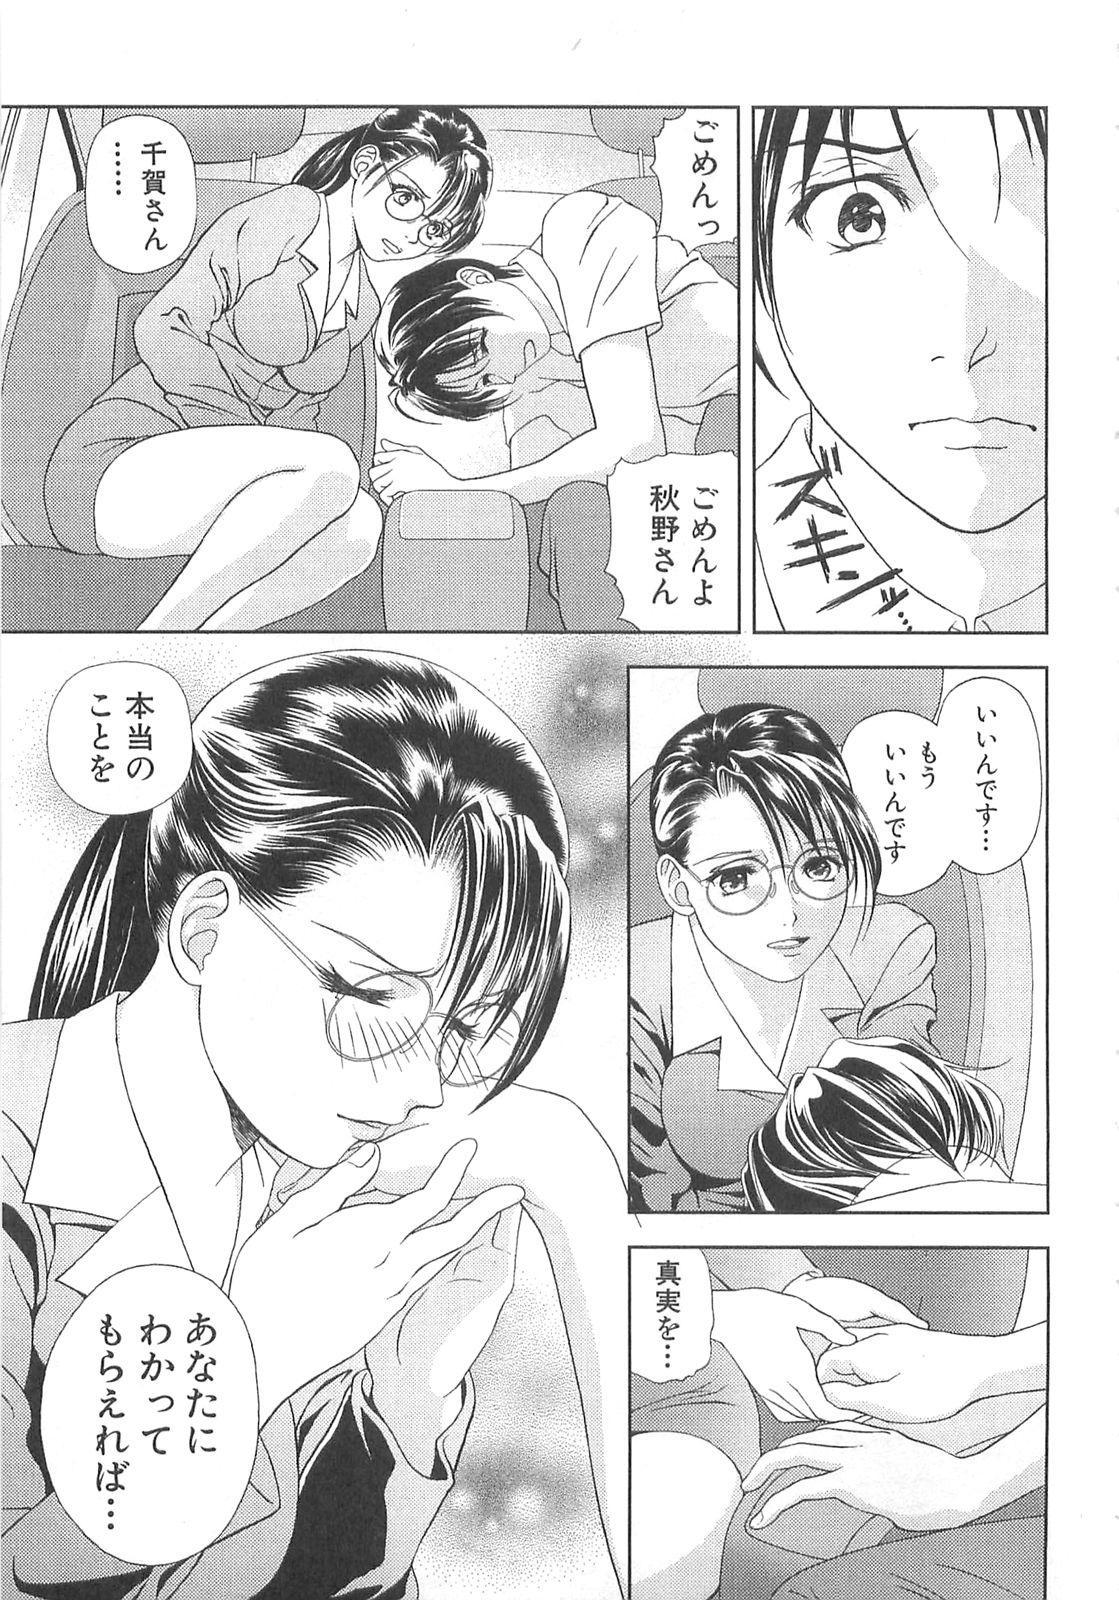 Tenshi no Kyuu - Angel's Pretty Hip 181